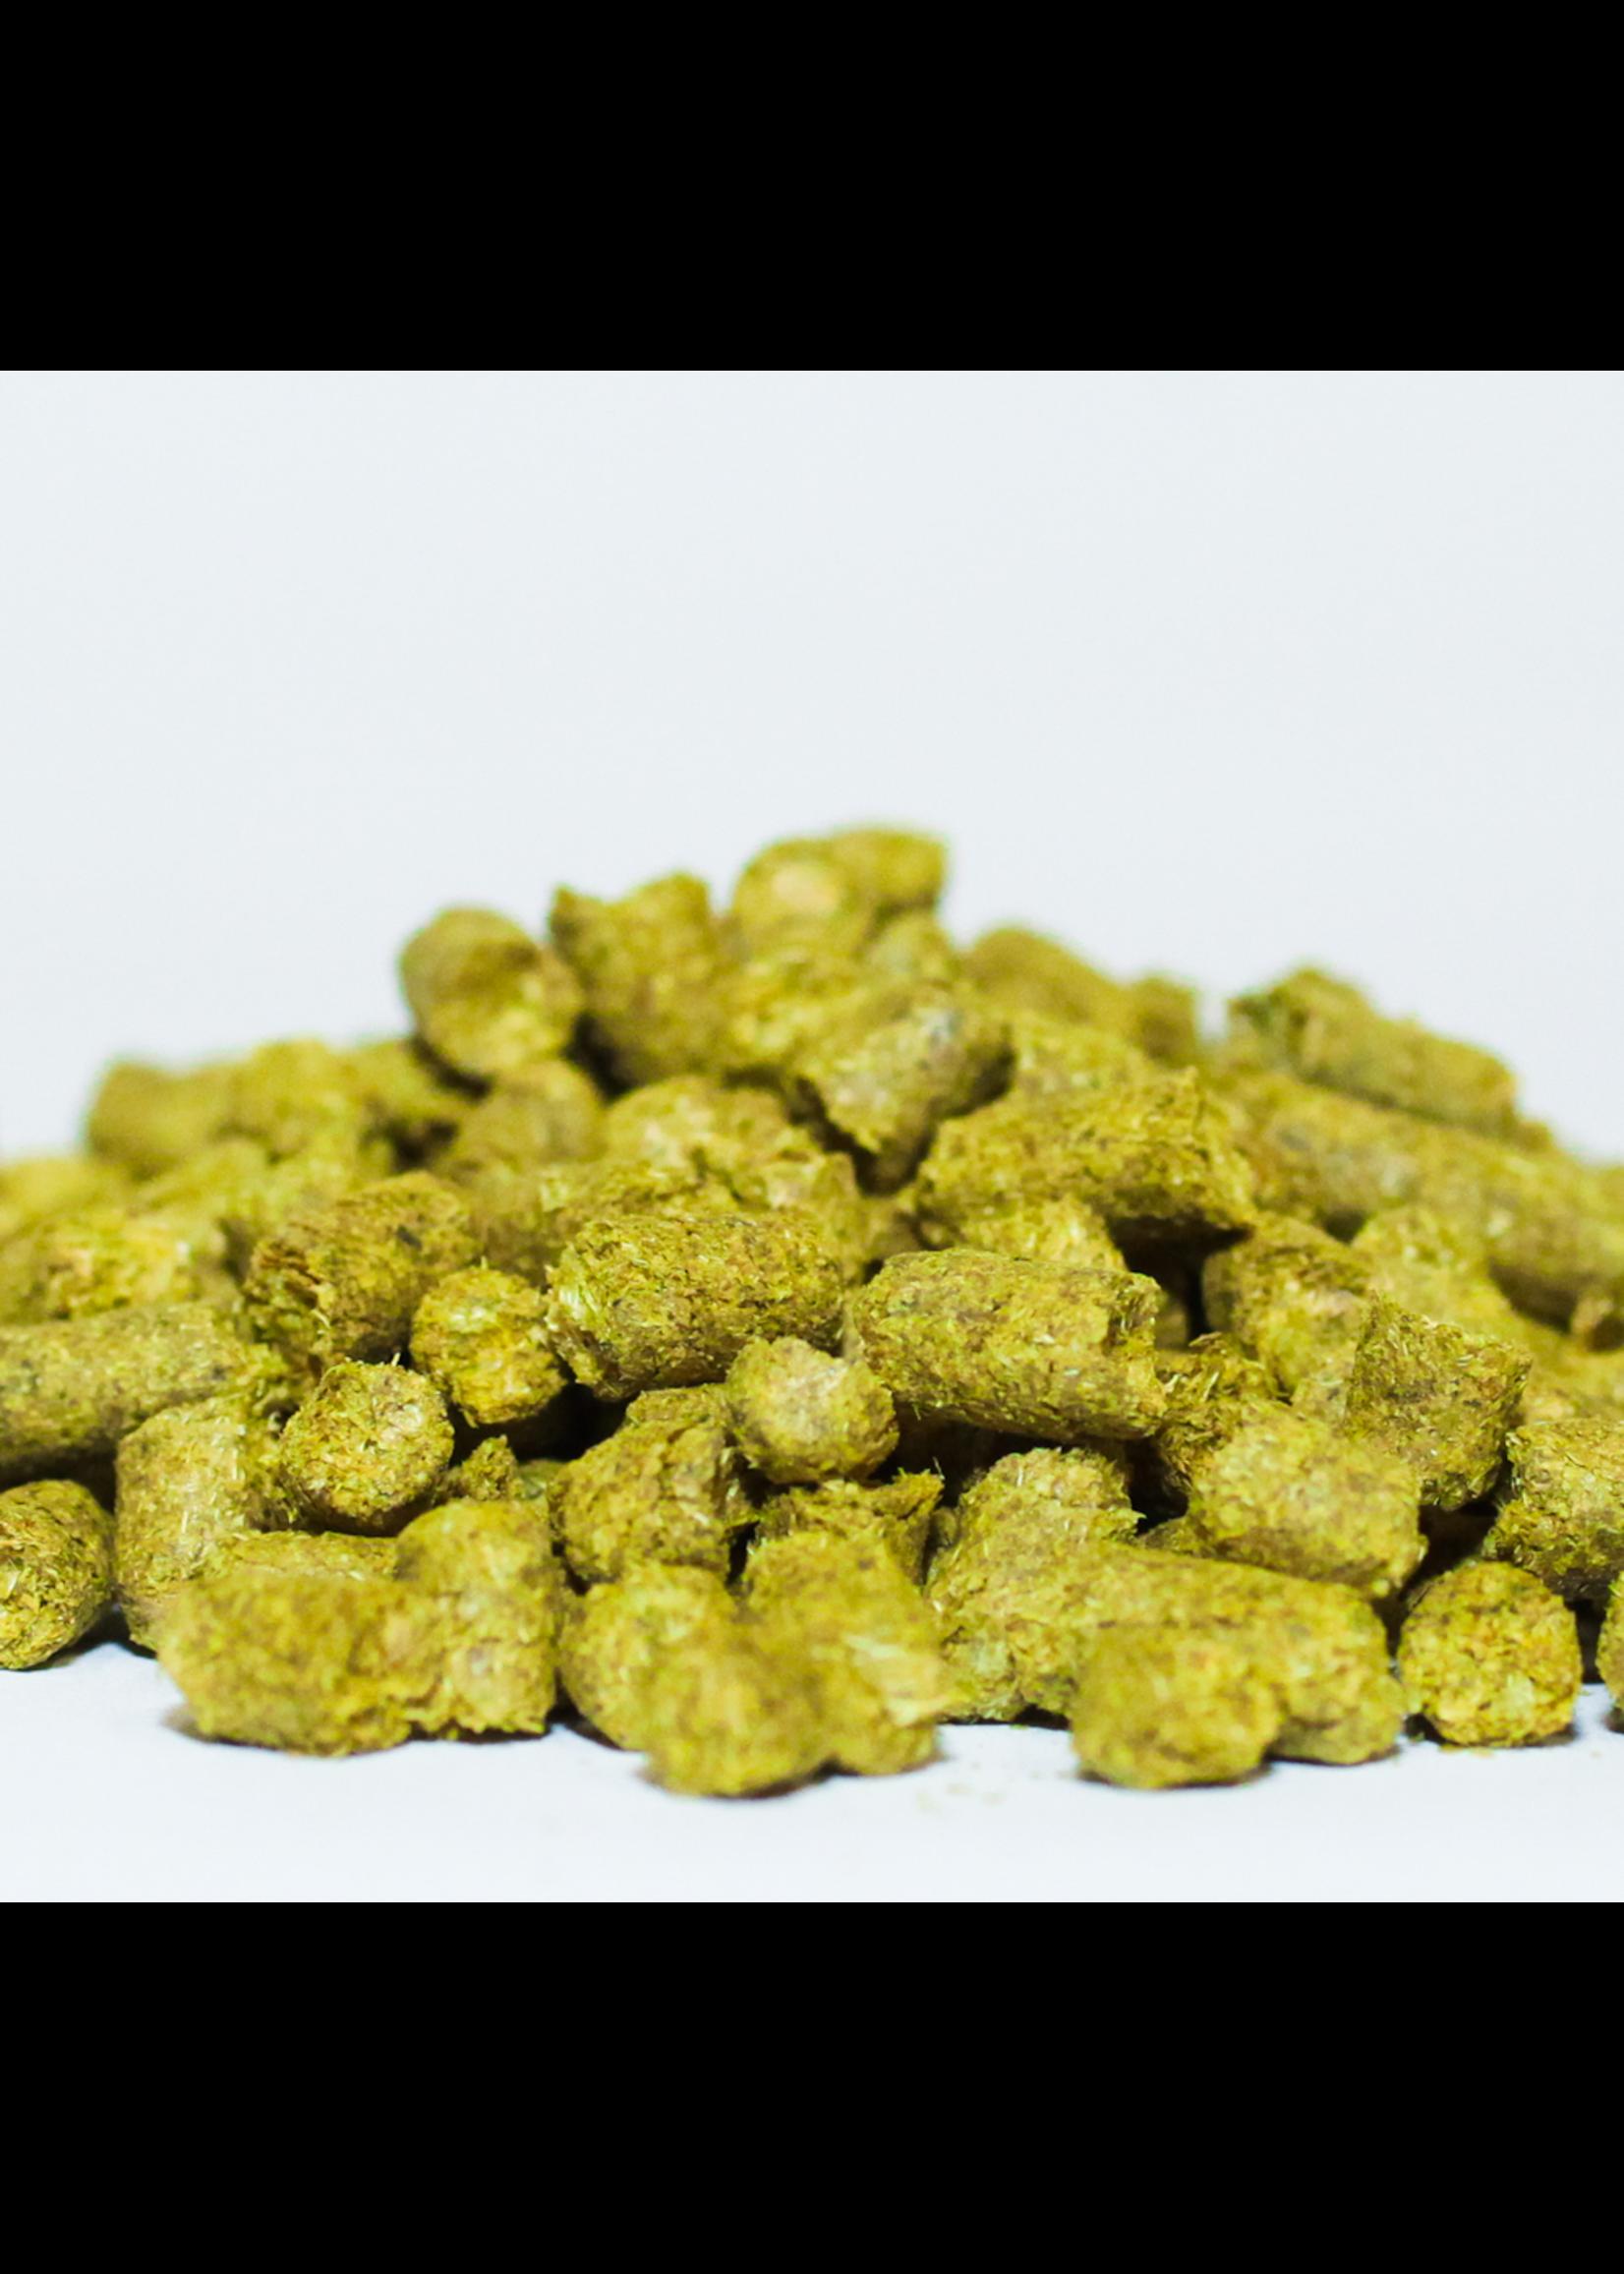 Hops Willamette Hops (US) - Pellets - 1 LB